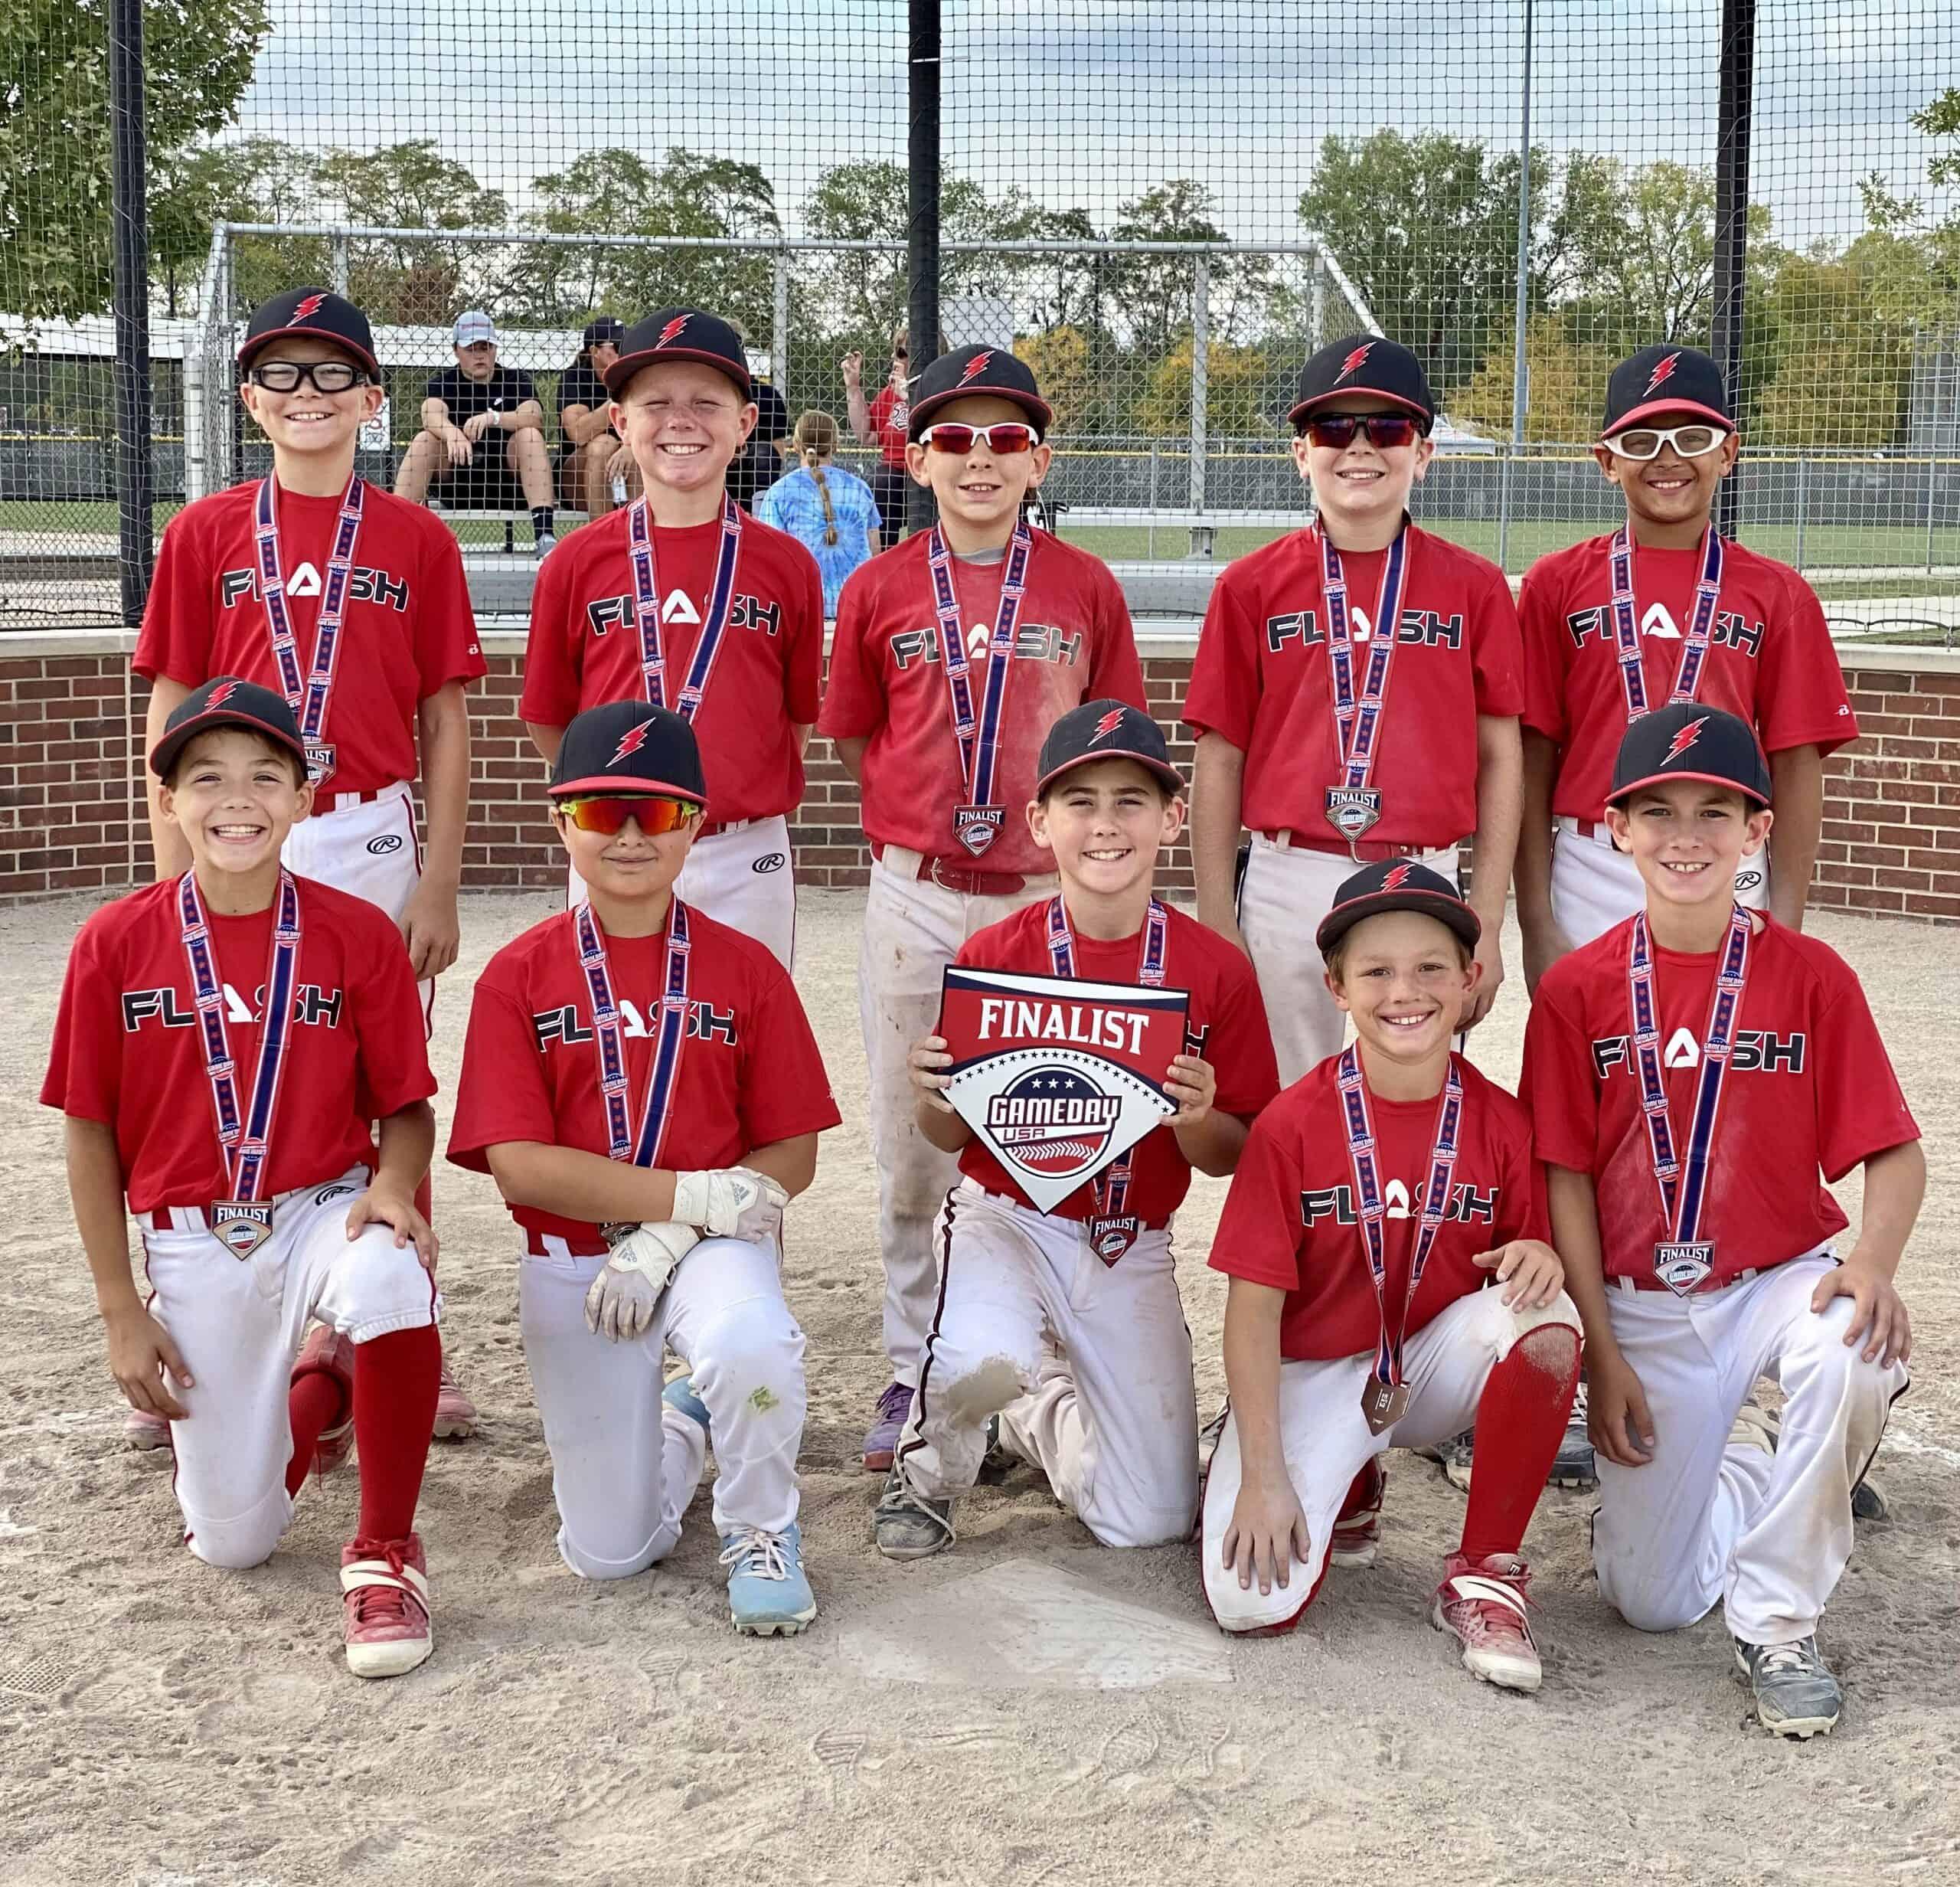 11U Flash baseball team kneeling holding a Gameday finalist home plate